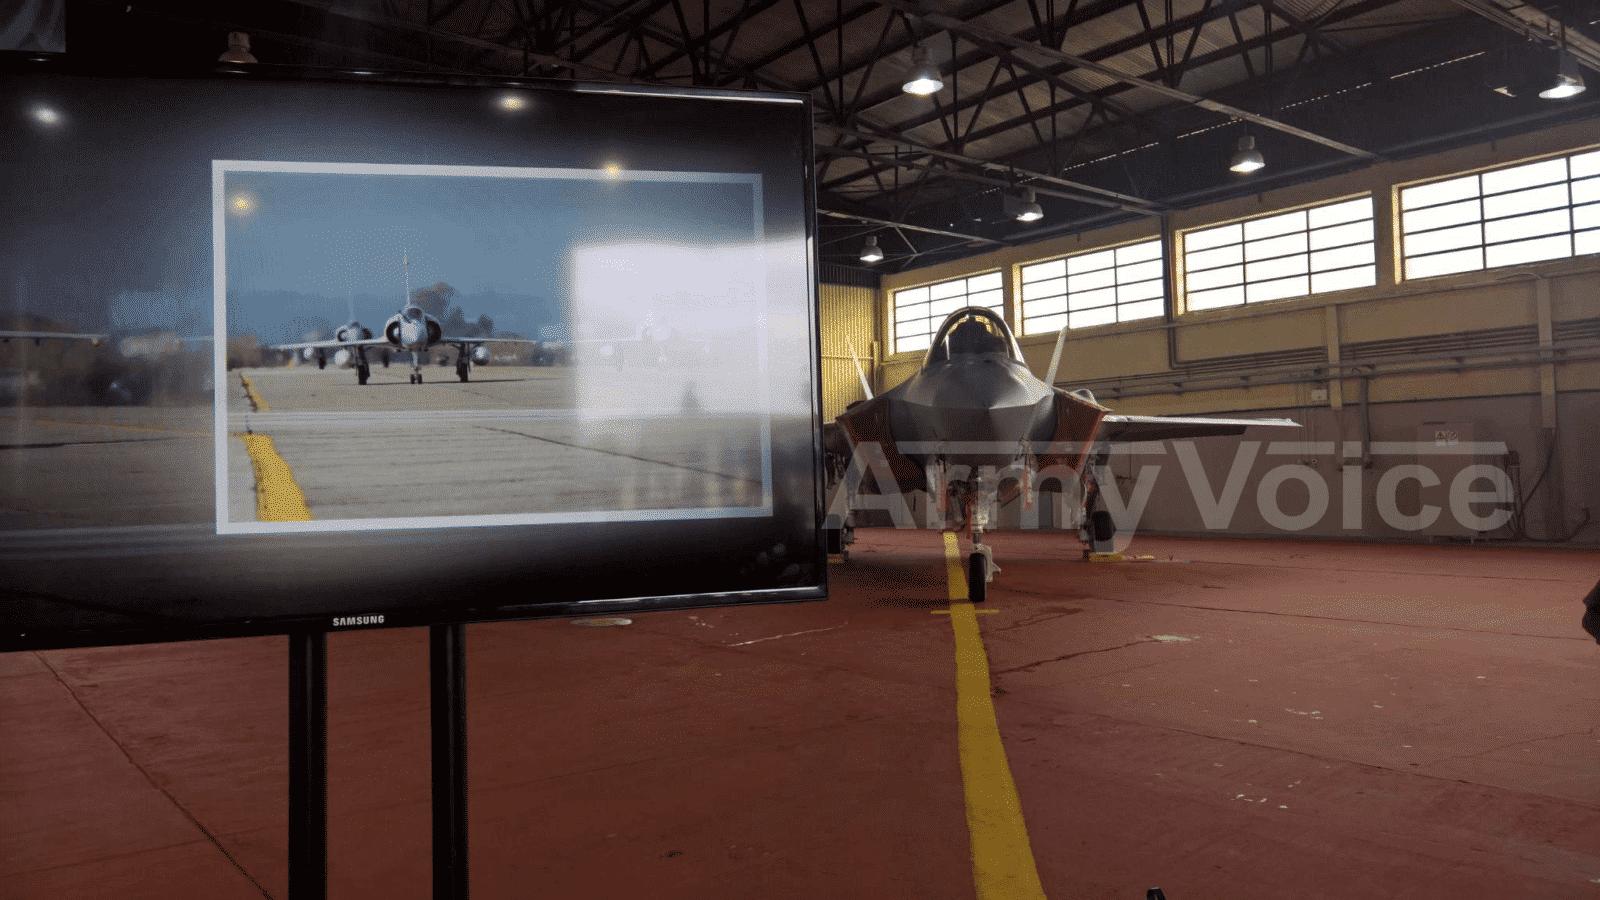 F35 στην Ανδραβίδα - Αποκλειστικές ΦΩΤΟ - Ηνίοχος2019